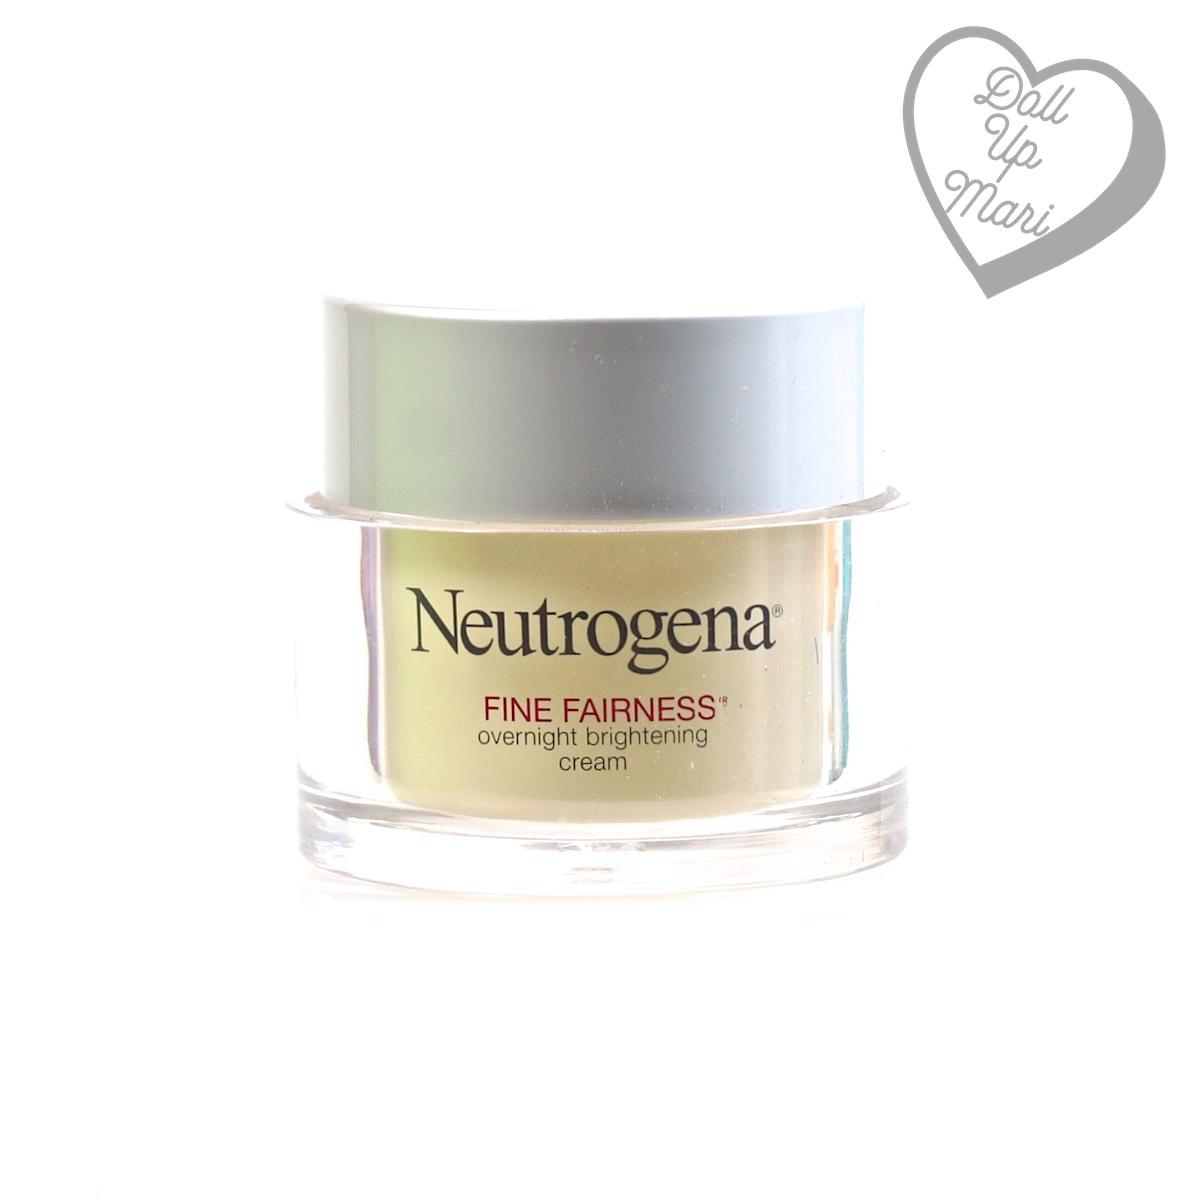 Neutrogena Overnight Fine Fairness Brightening Cream